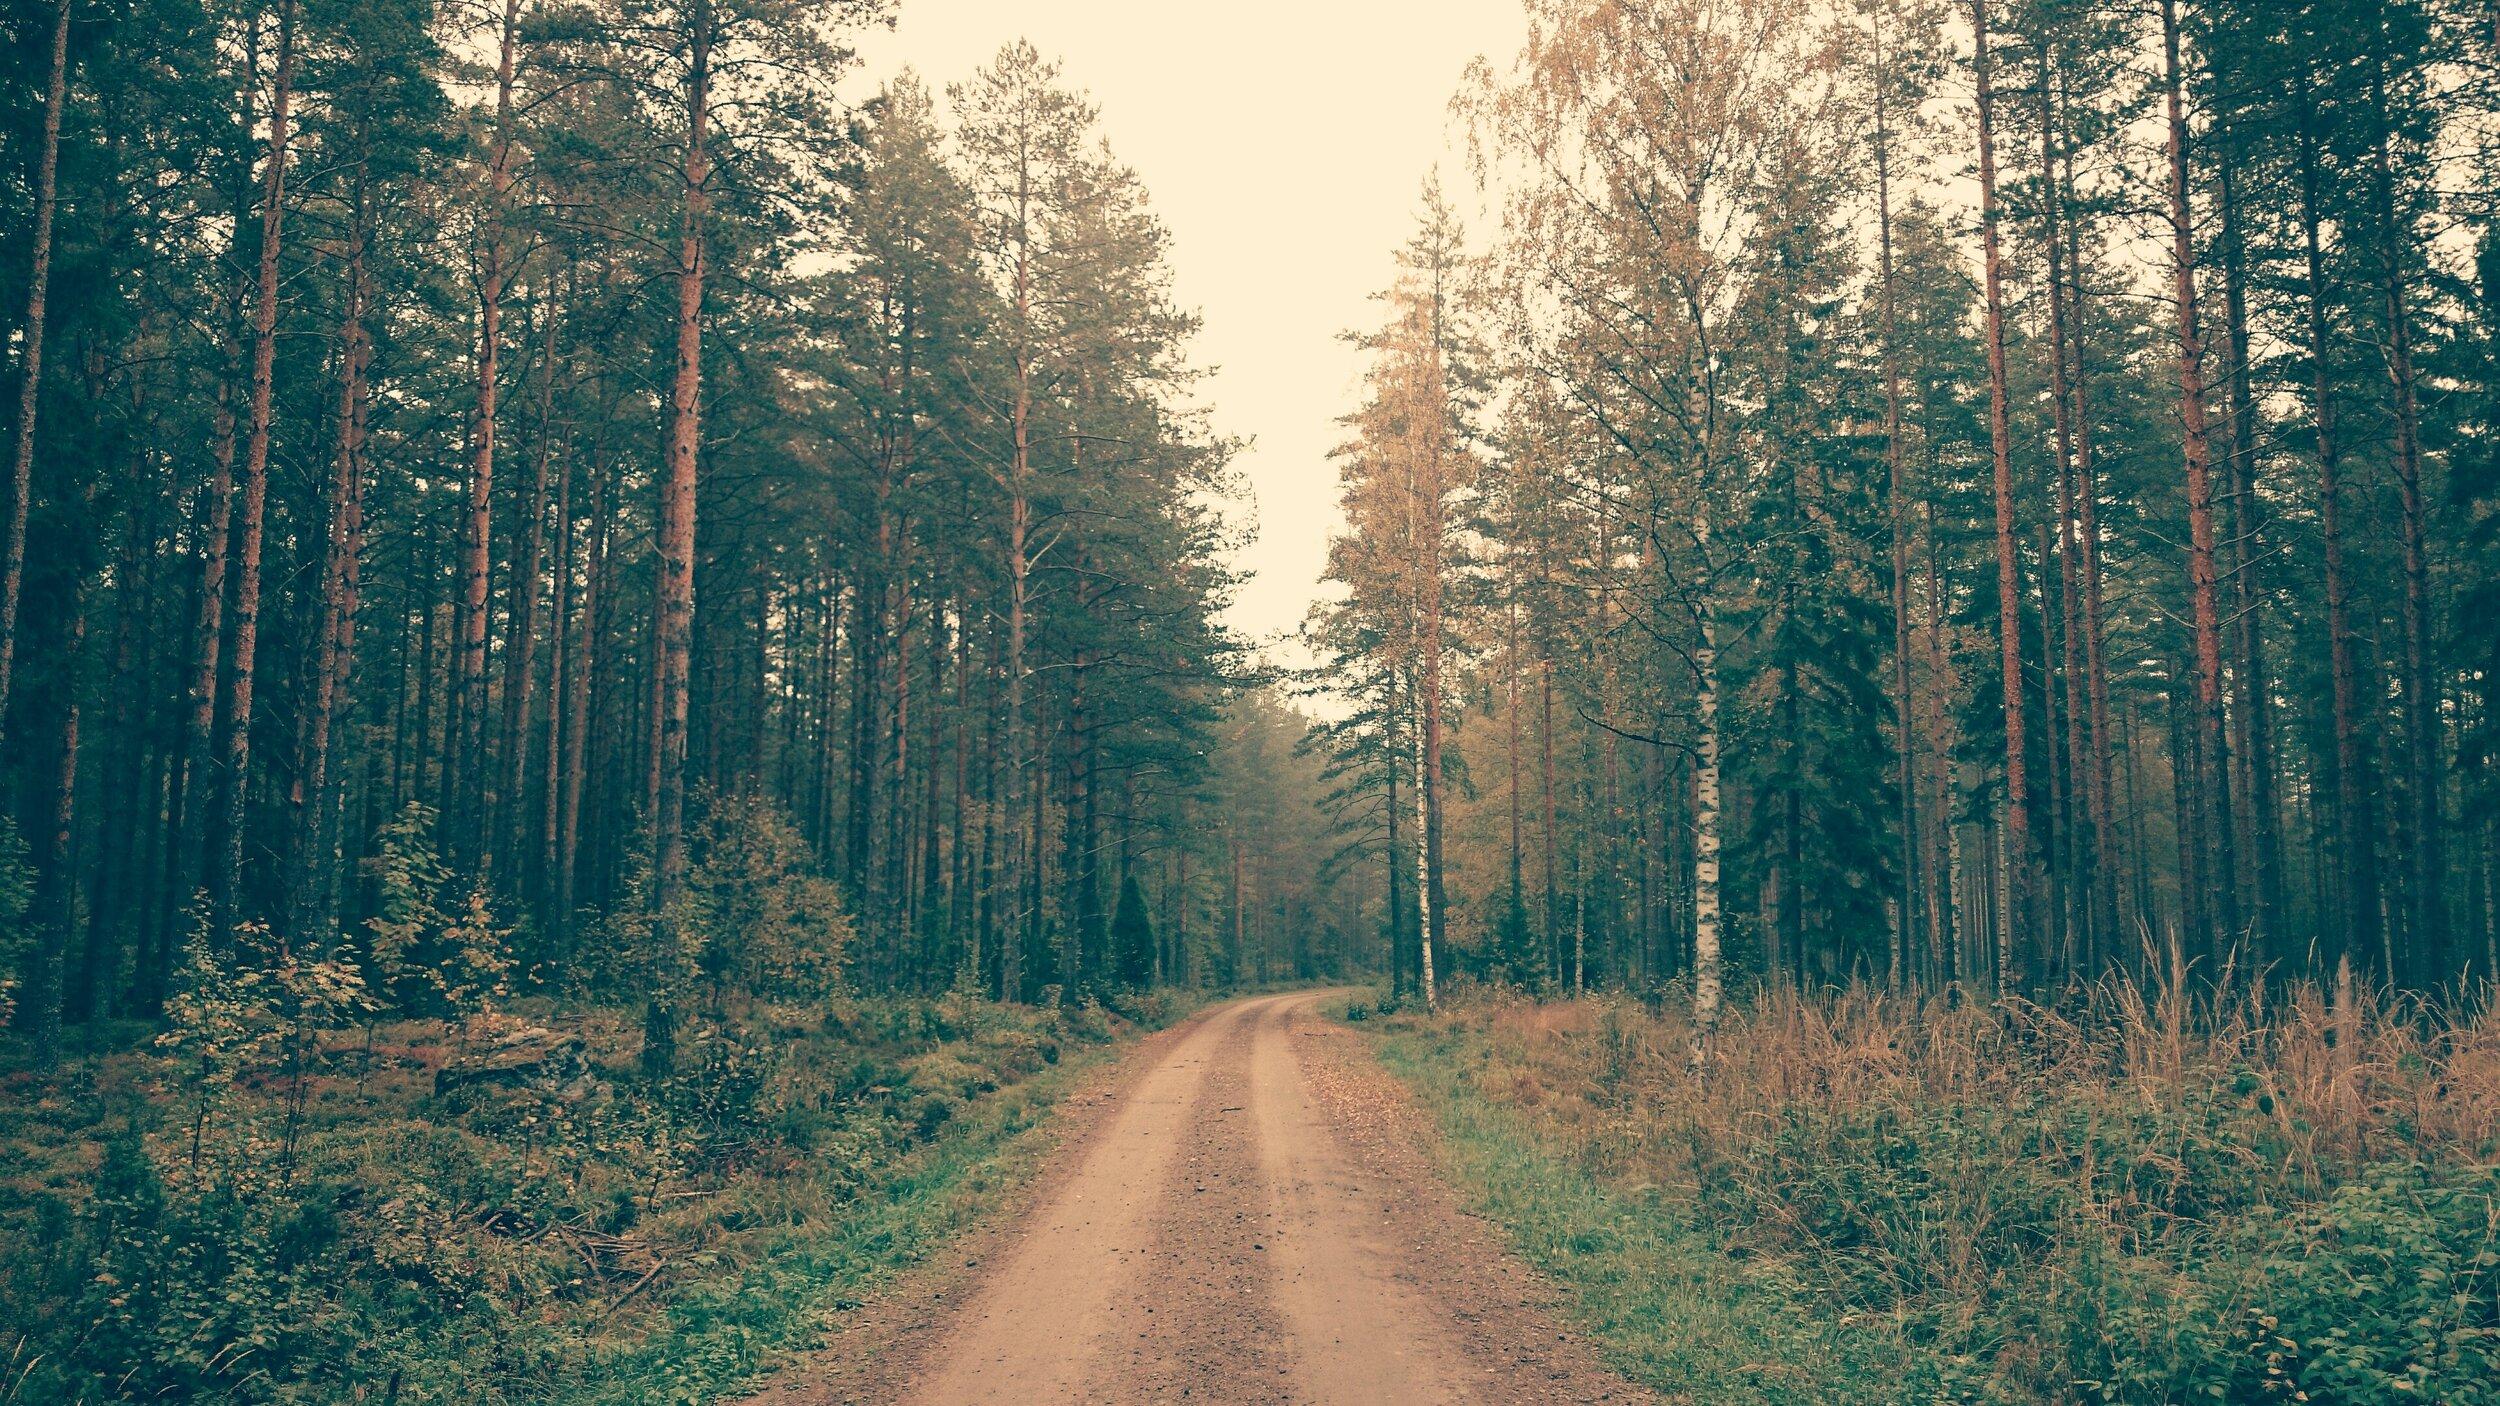 aforestation-dirt-road-dusty-road-52599.jpg